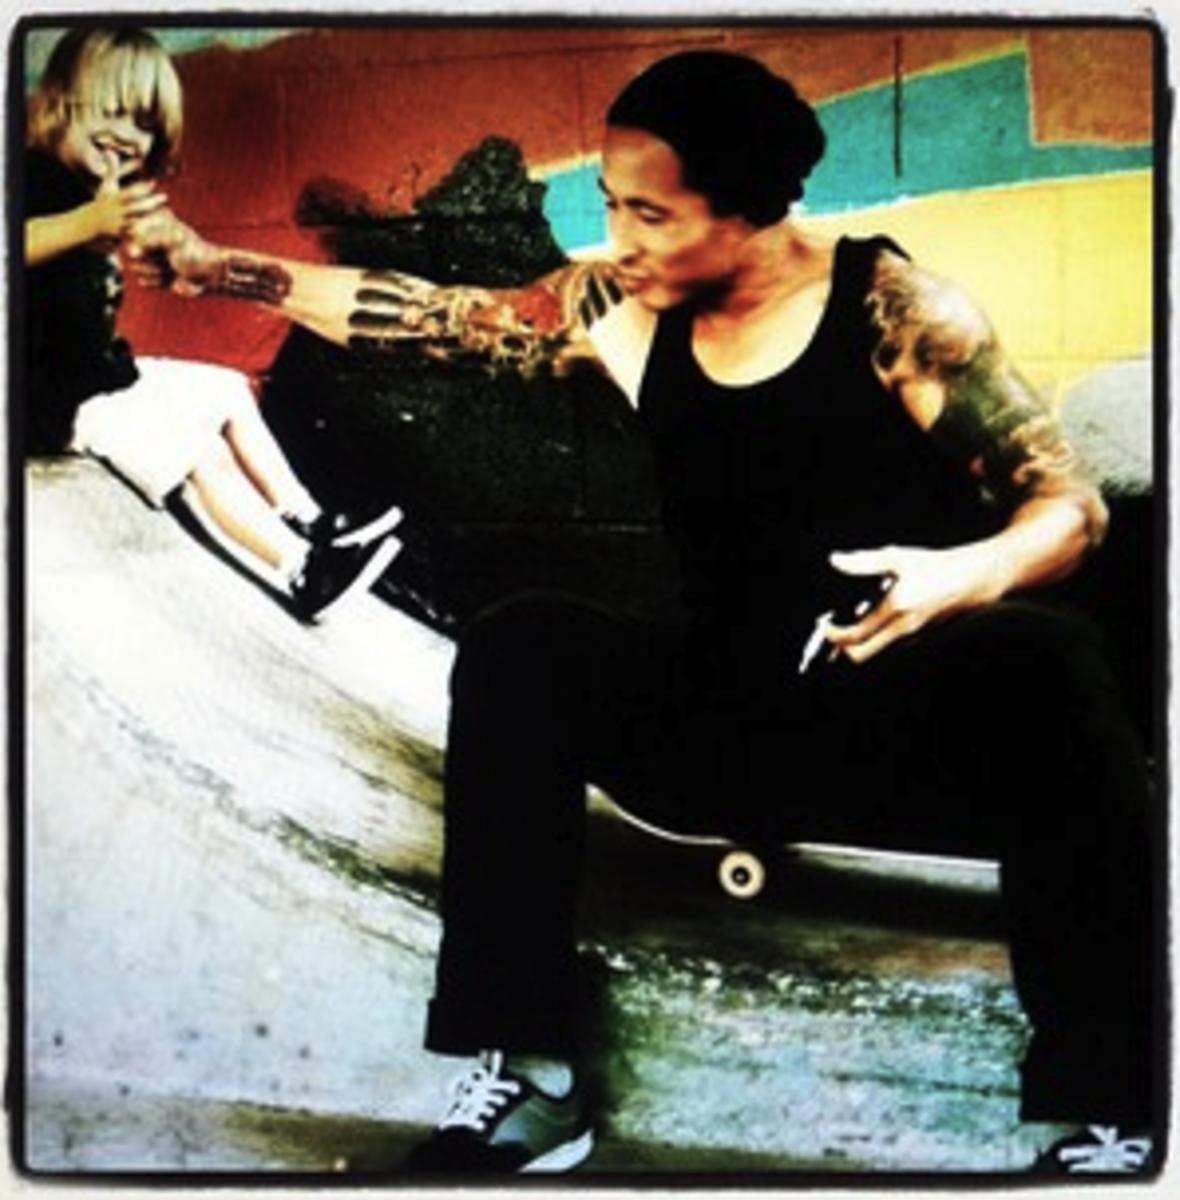 Professional Skateboarder, Daewon Song